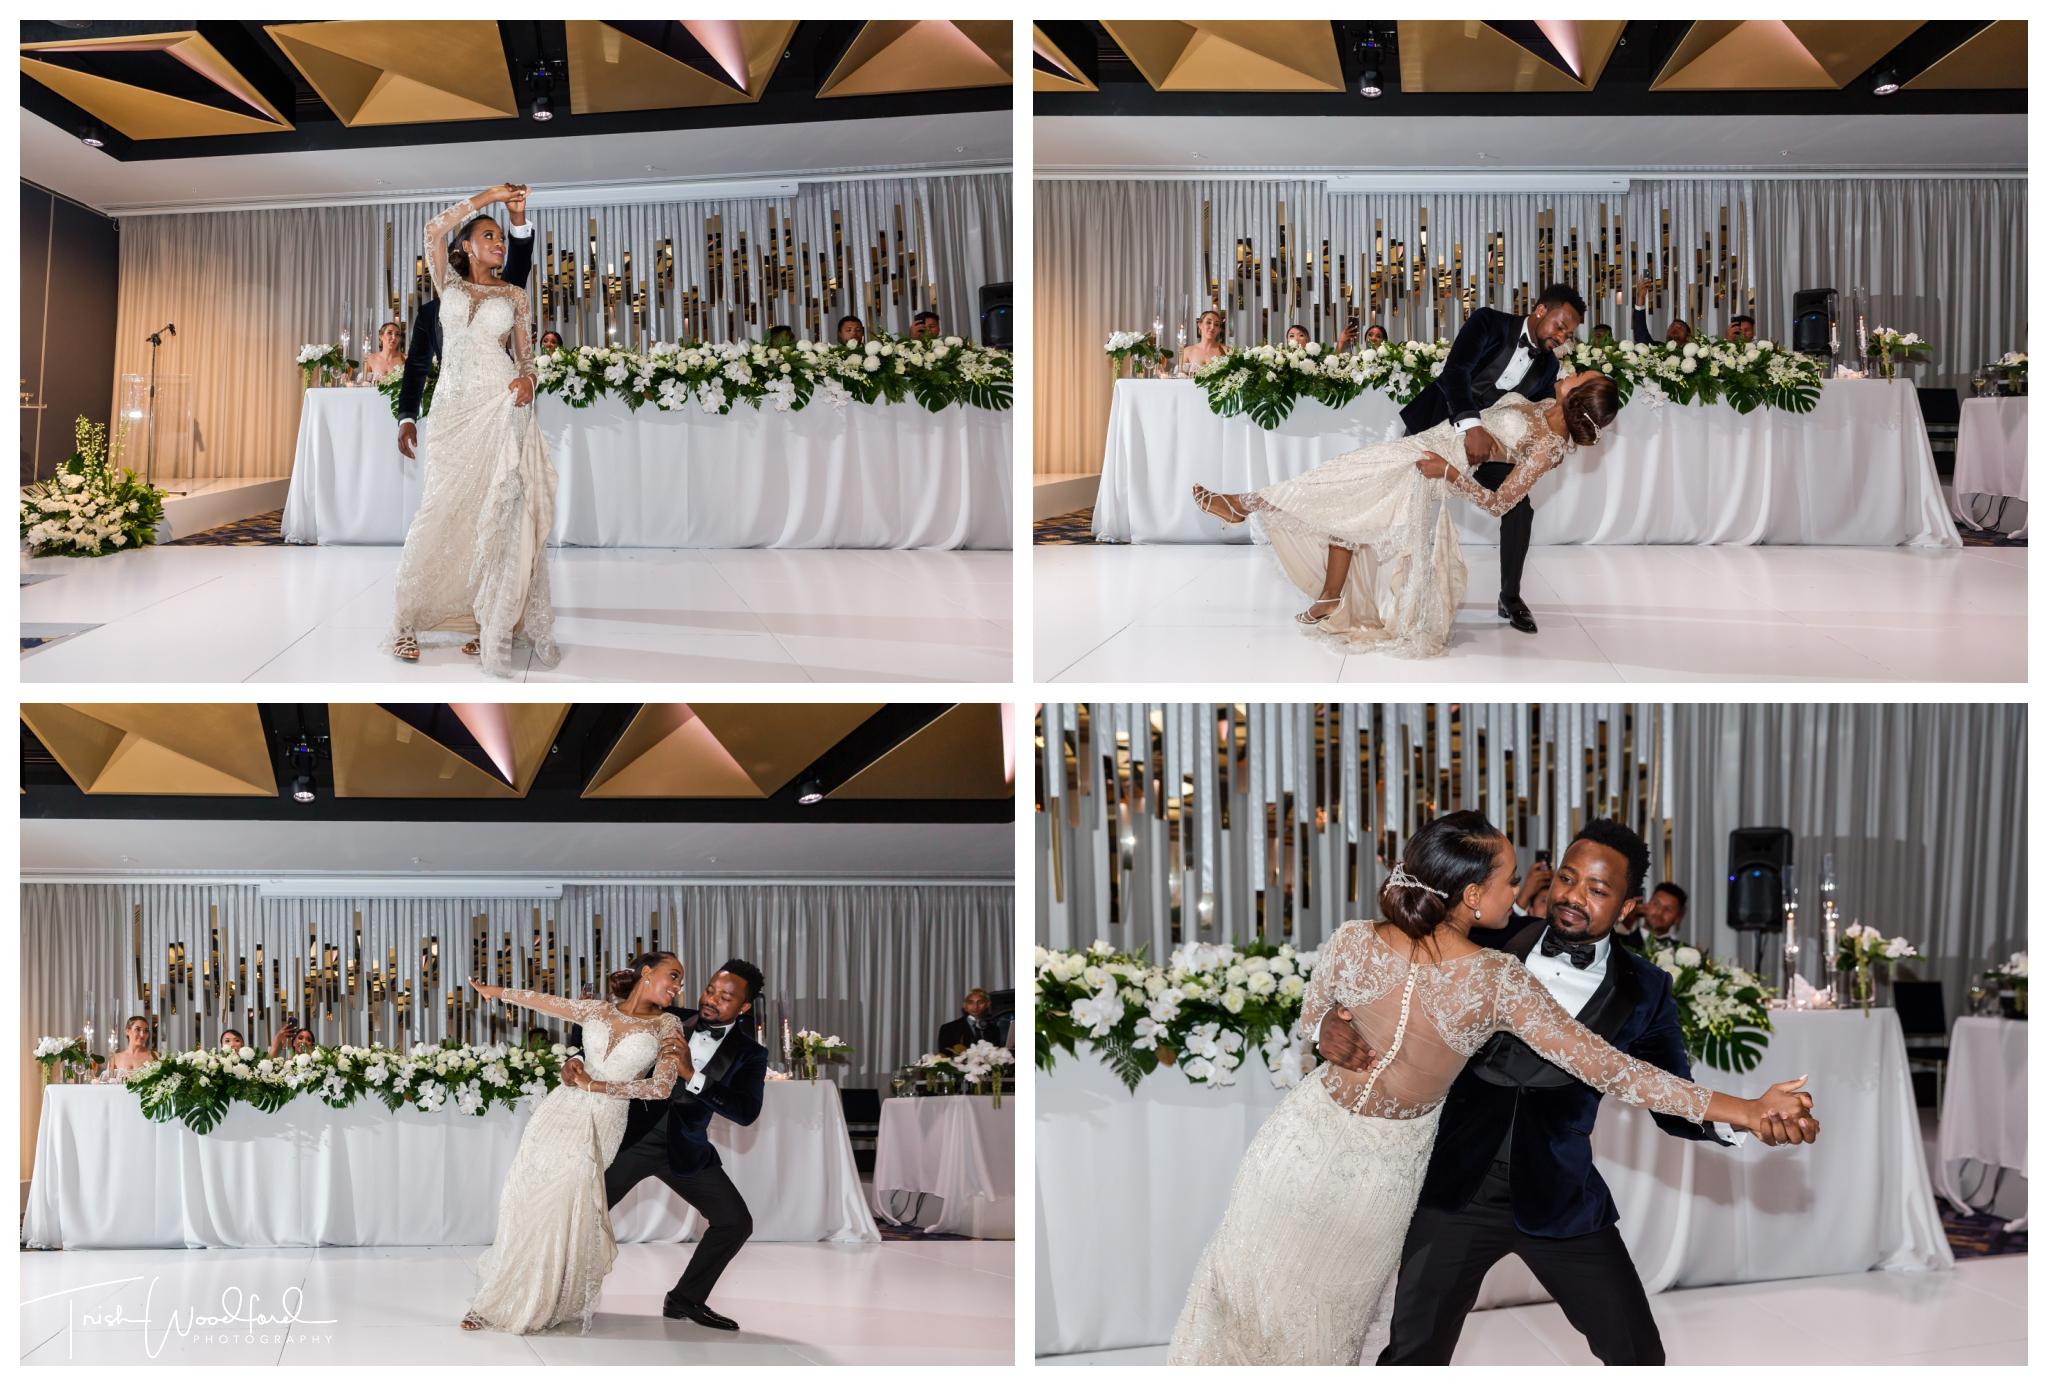 Wedding Dance Beaumonde on the Point